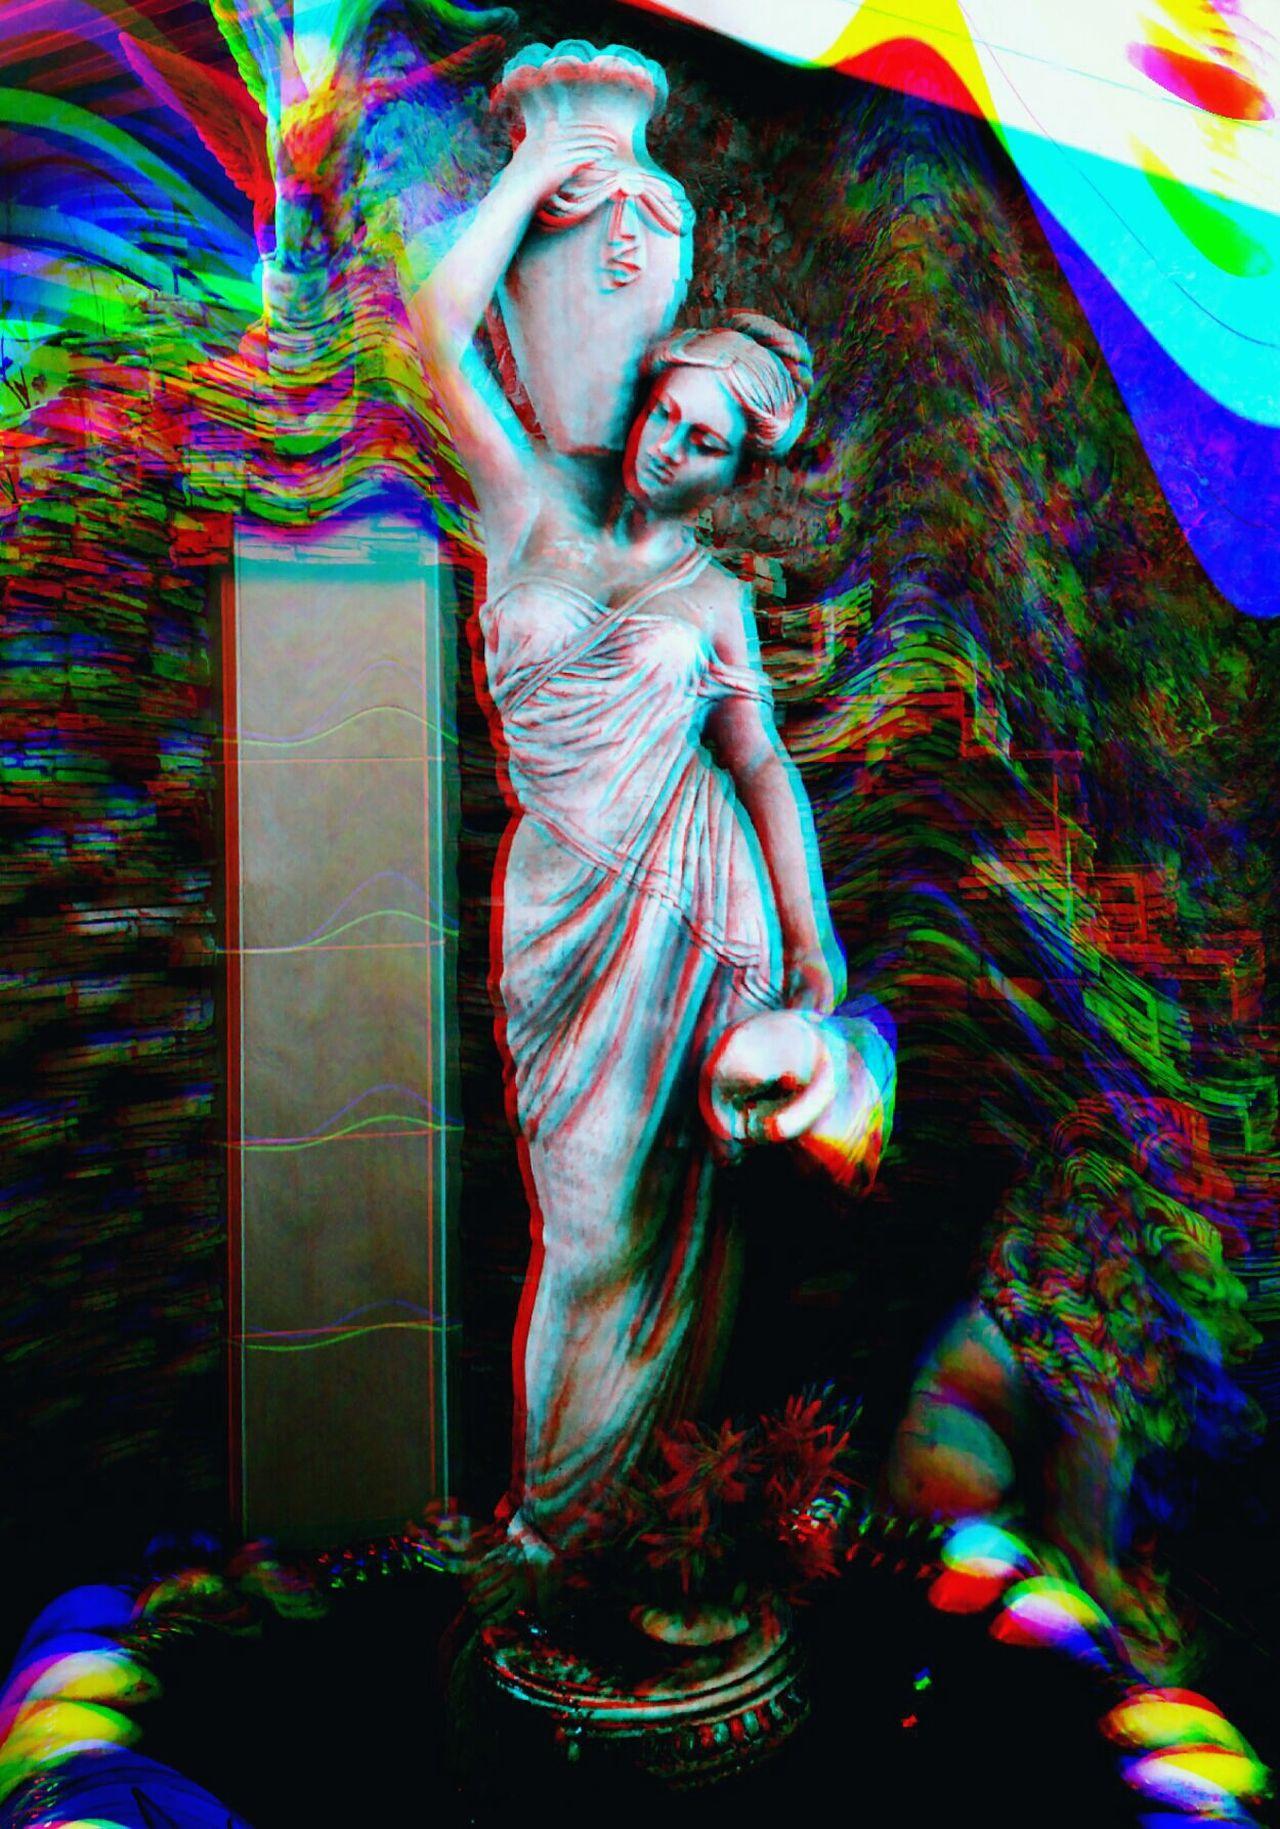 безумие  эстетика 3D Camly сдвиг